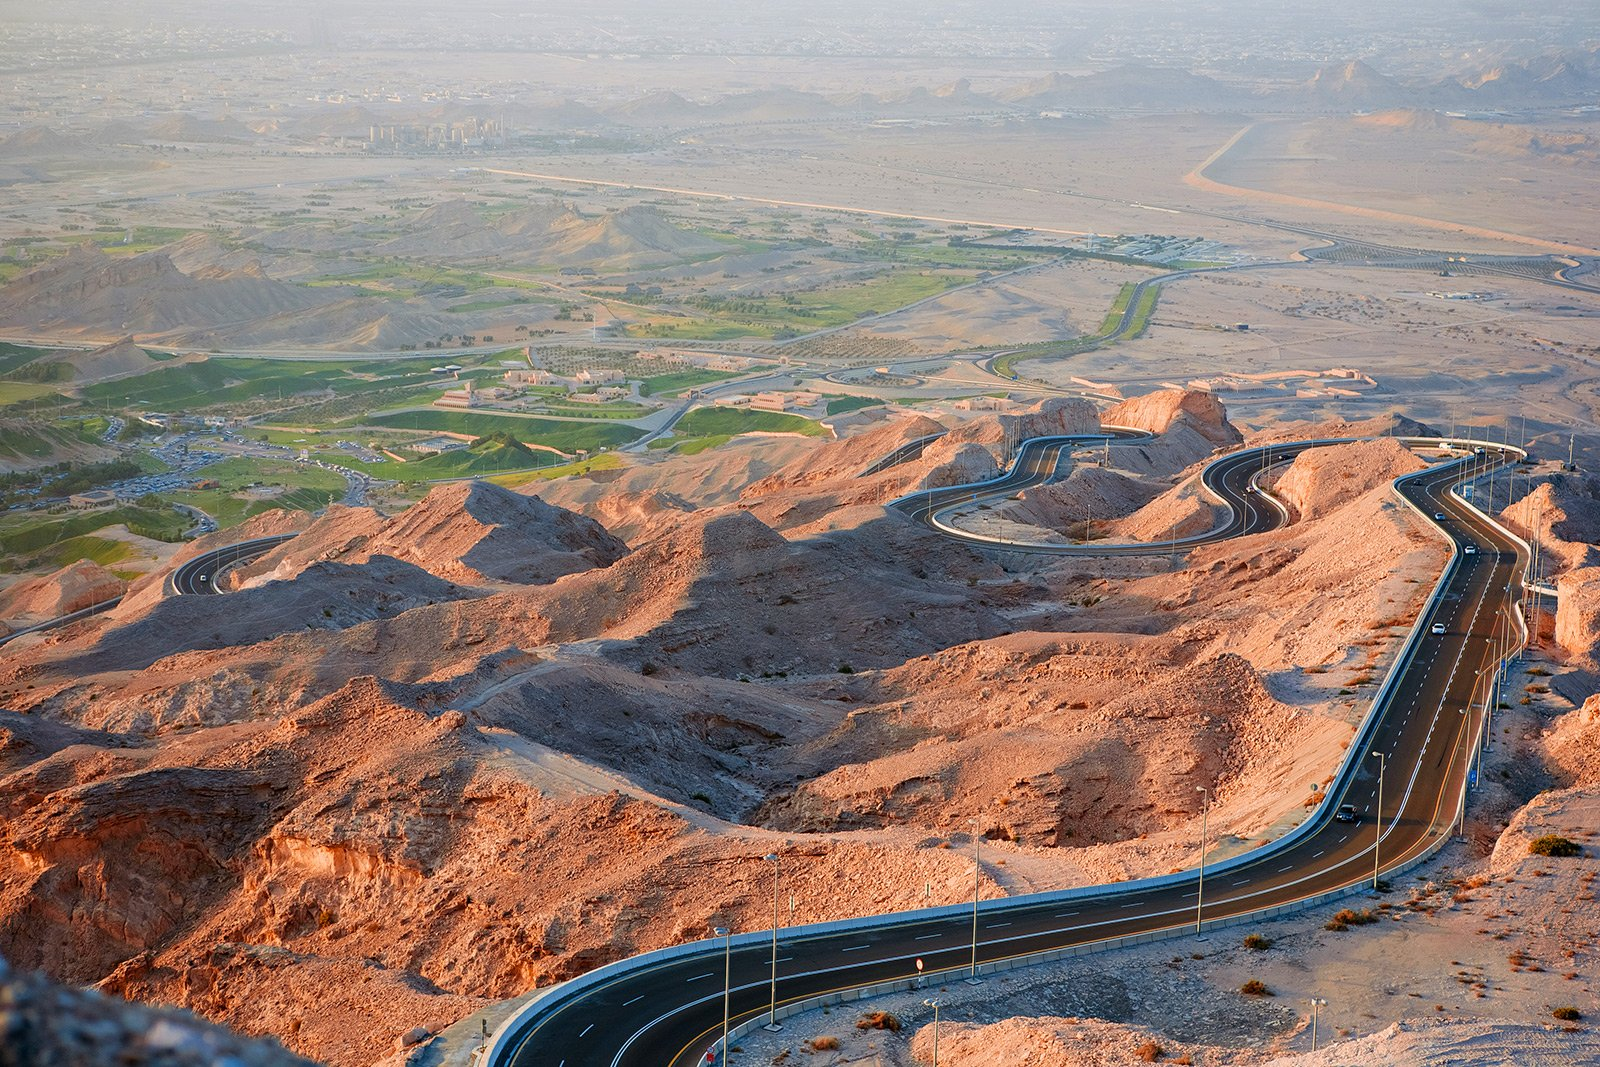 How To Climb Jebel Hafeet Mountain In Al Ain